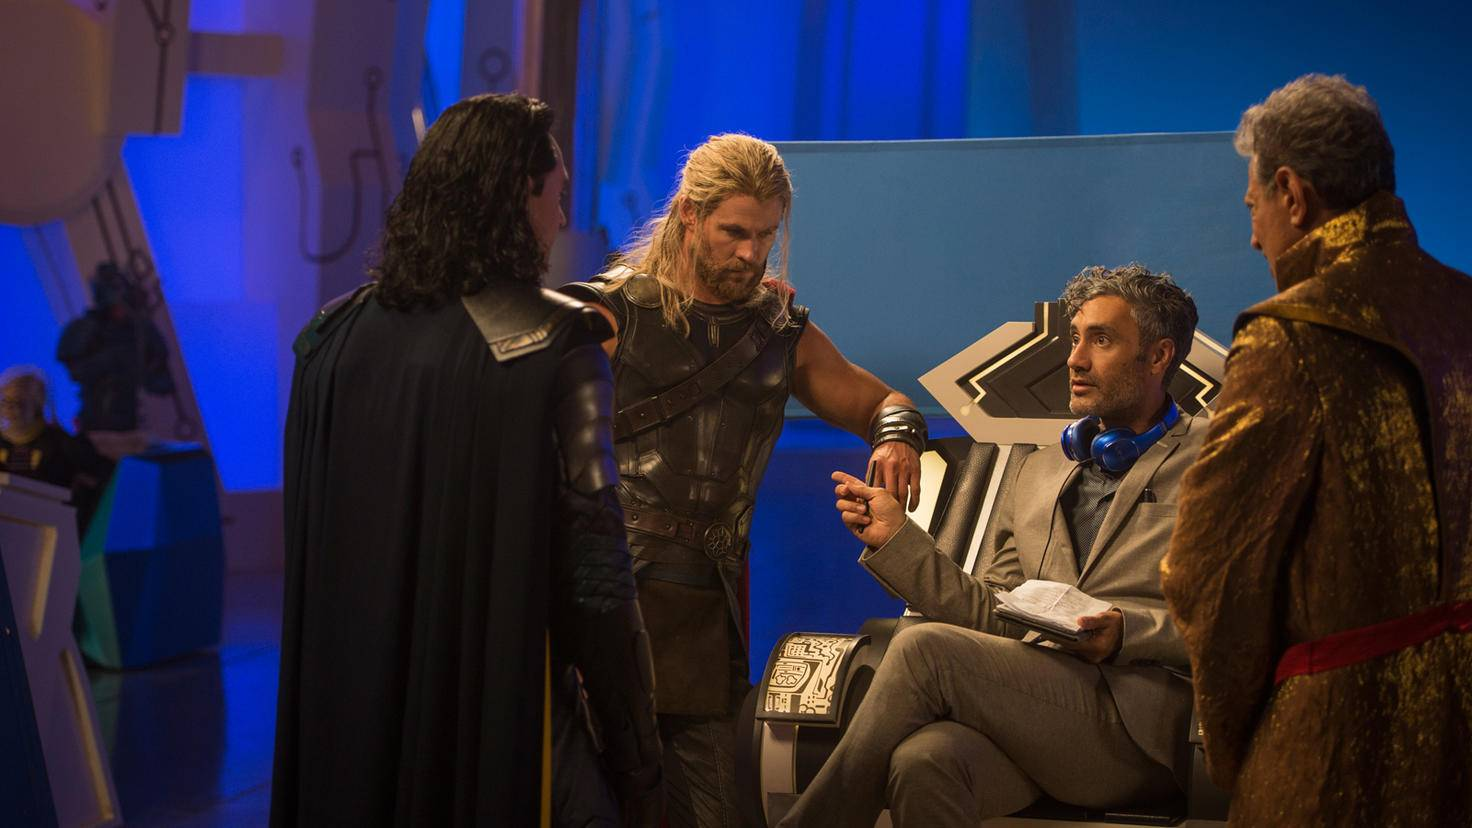 Thor 3 director Taika Waititi